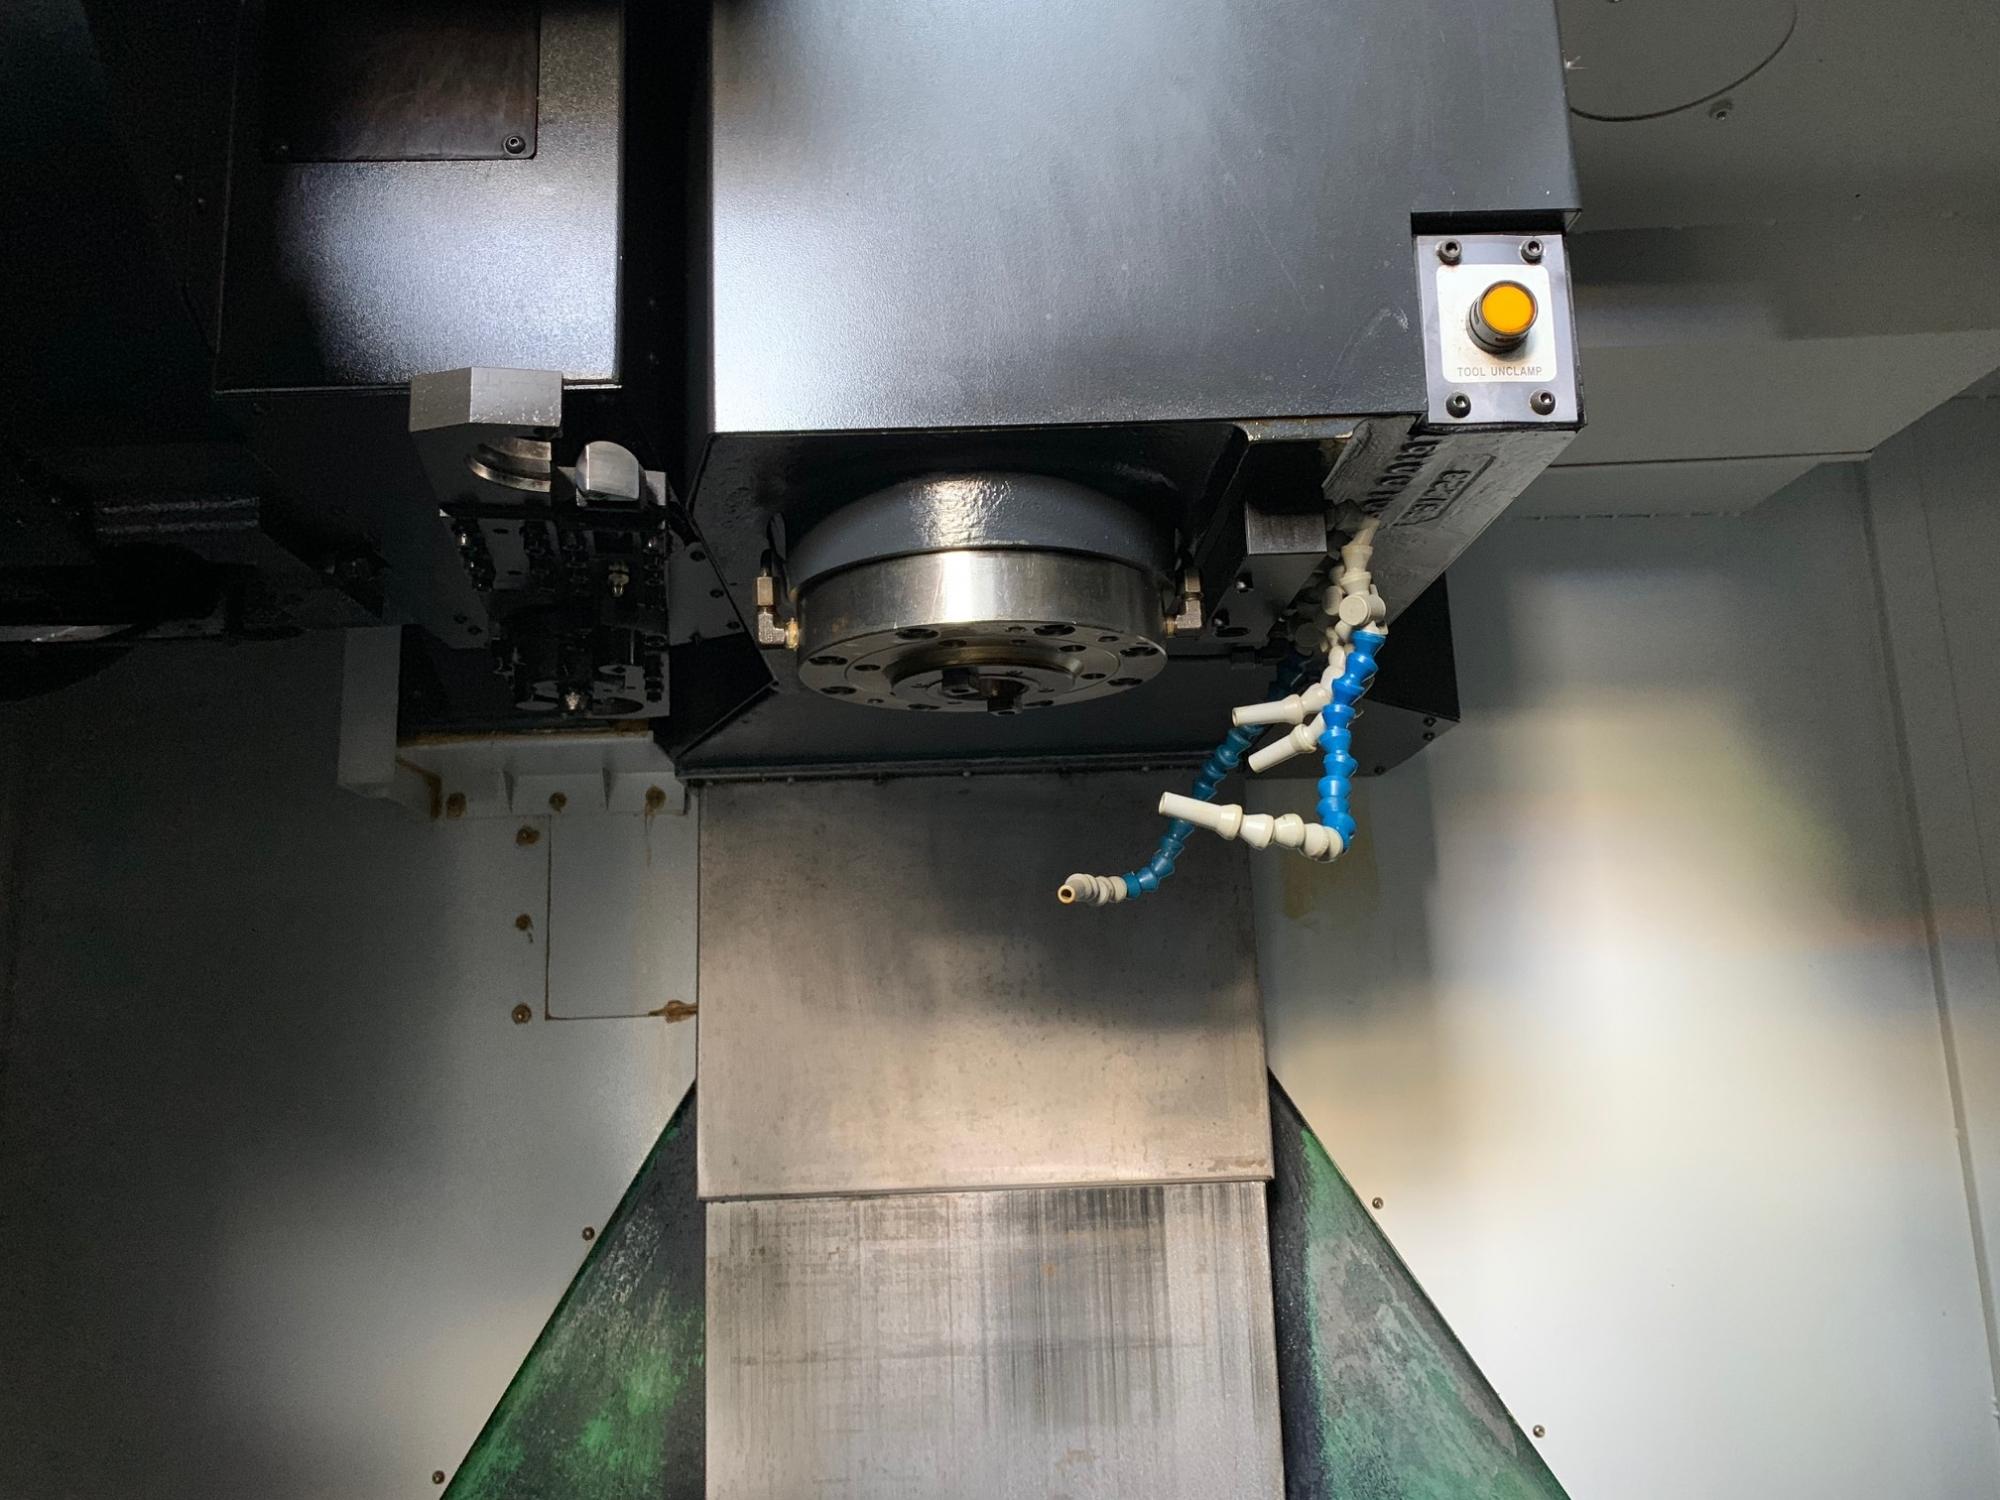 2011 Doosan Mynx 6500 - Vertical Machining Center